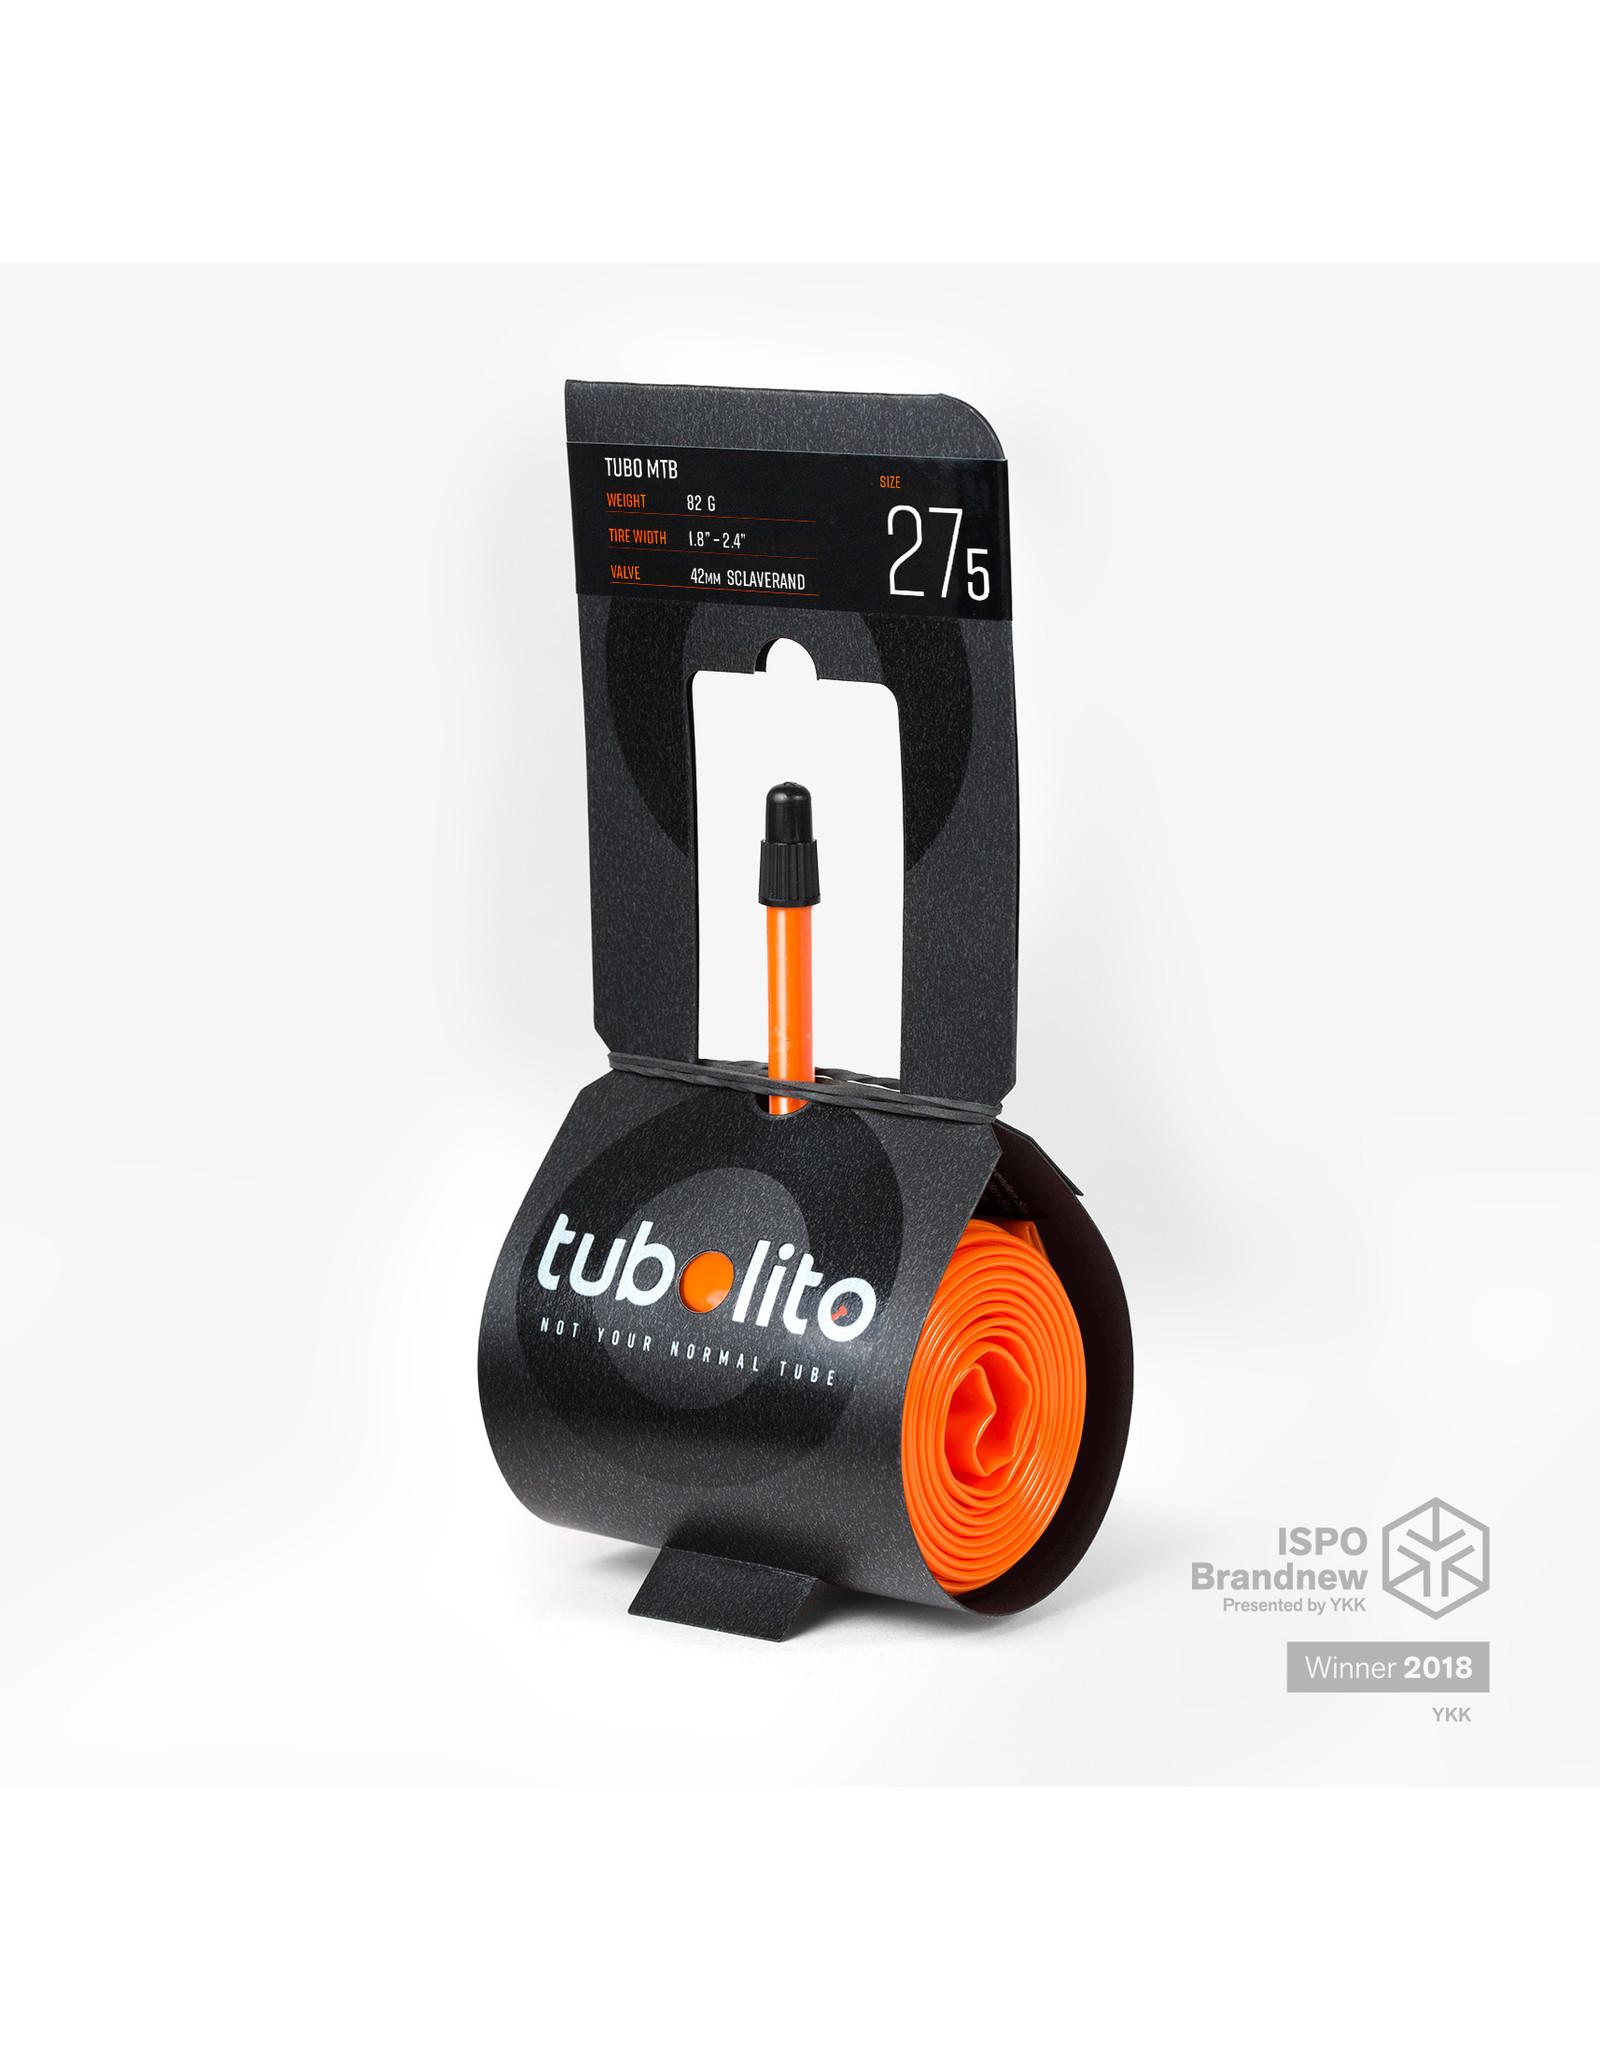 "Tubolito Tubolito Tubo MTB 27.5"" x 1.8 - 2.4 42mm Presta Valve"